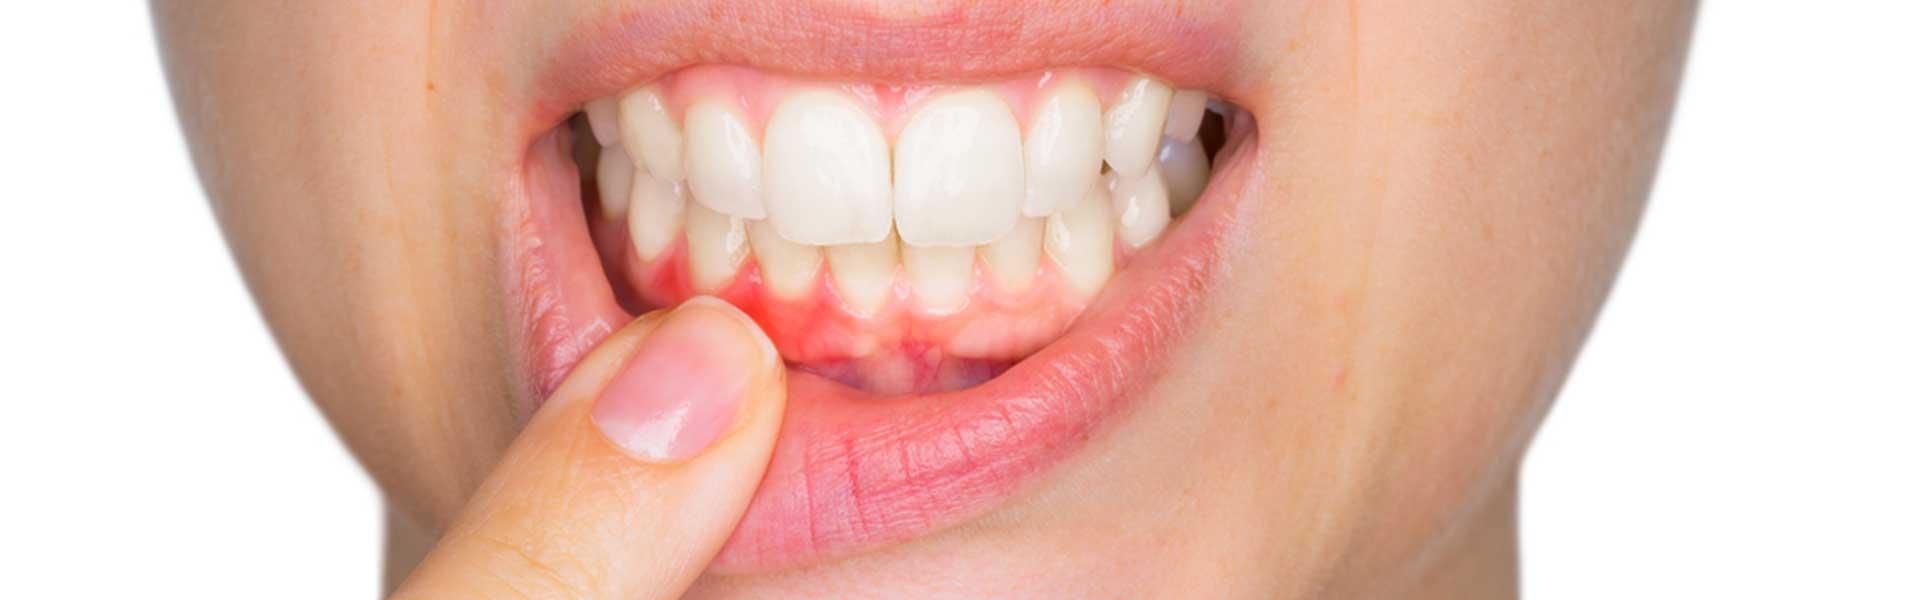 NE Calgary Periodontal Gum Therapy | Pathways Dental Clinic